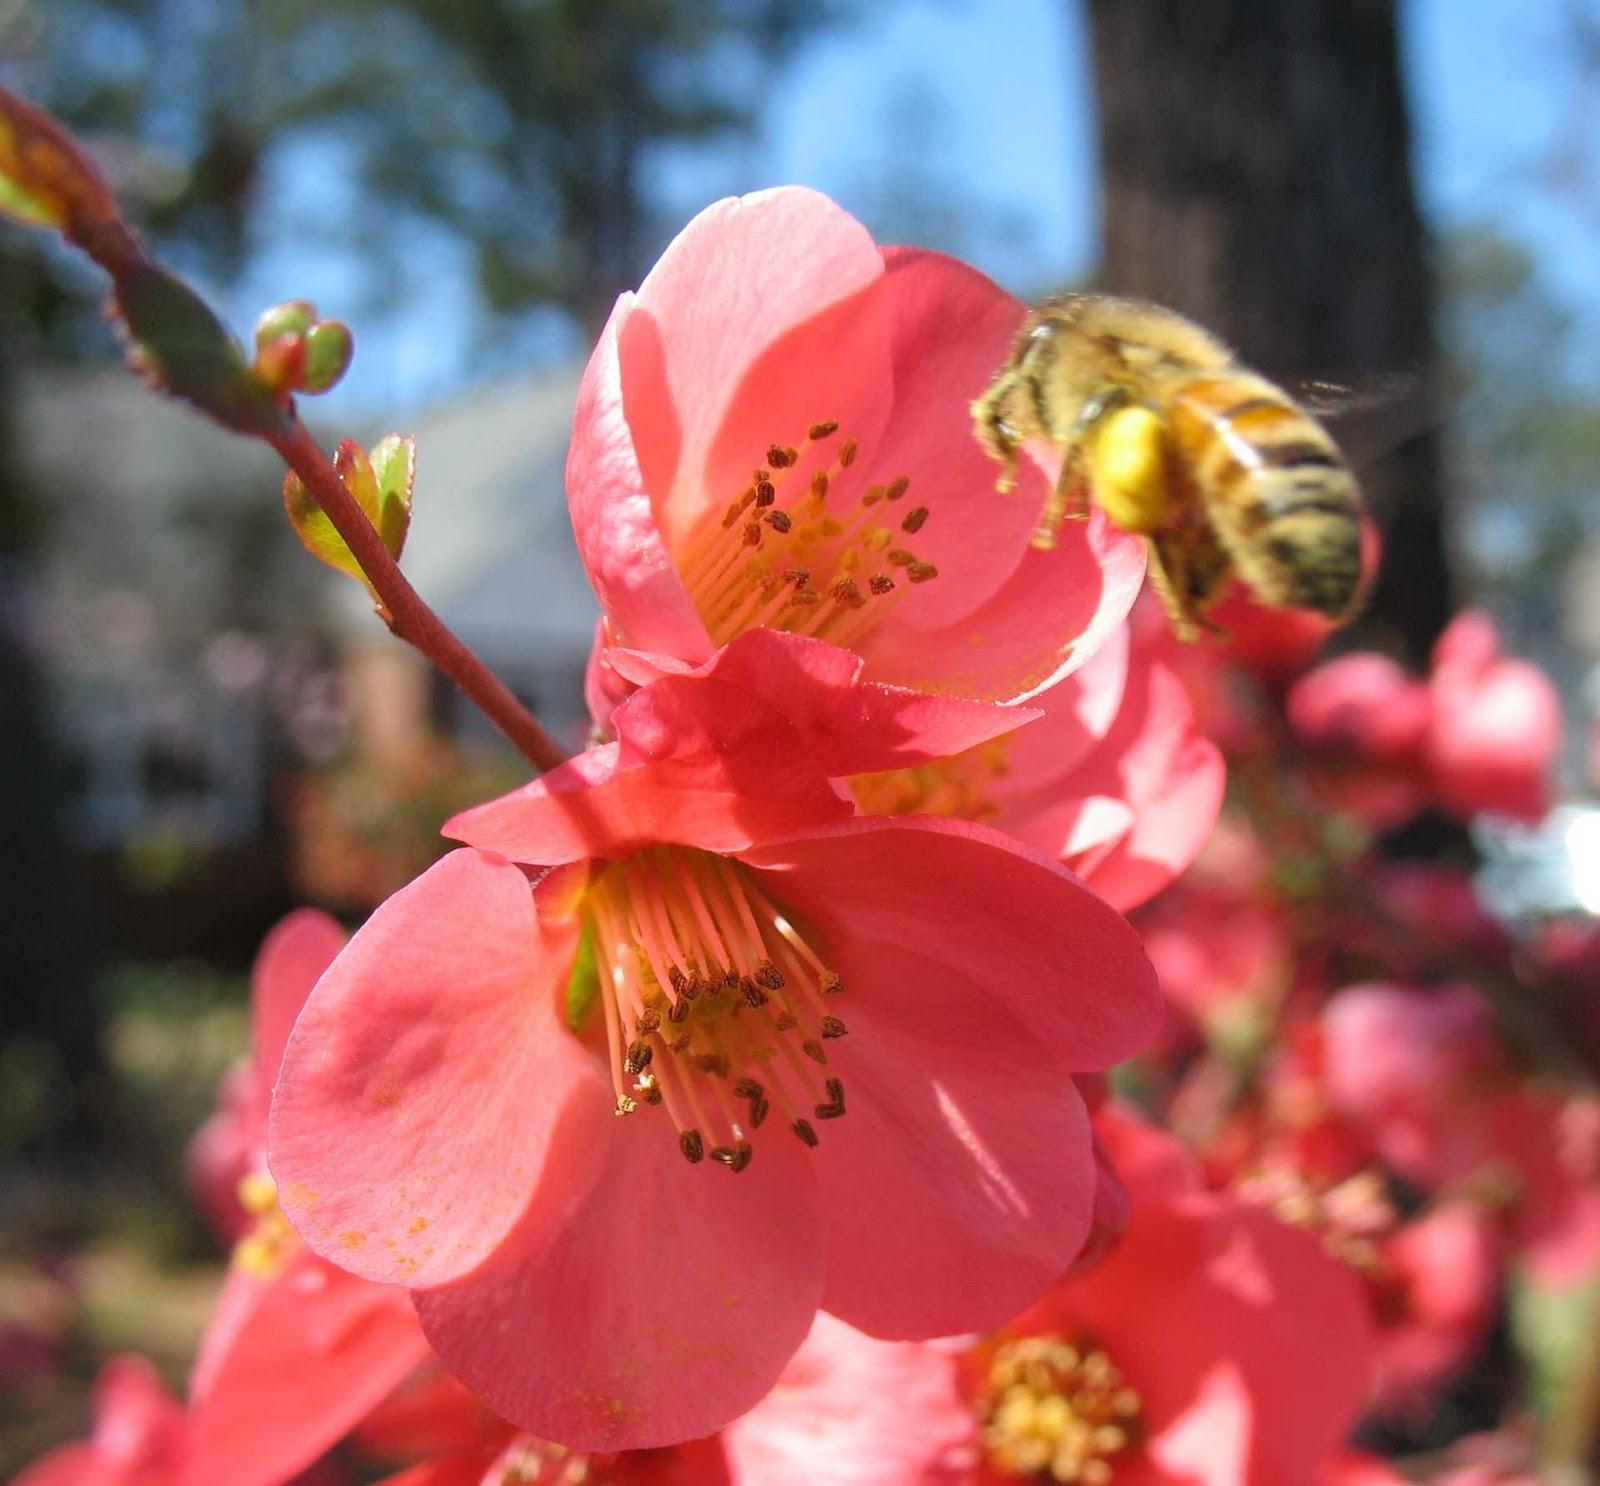 Using Georgia Native Plants: Native Pollinators